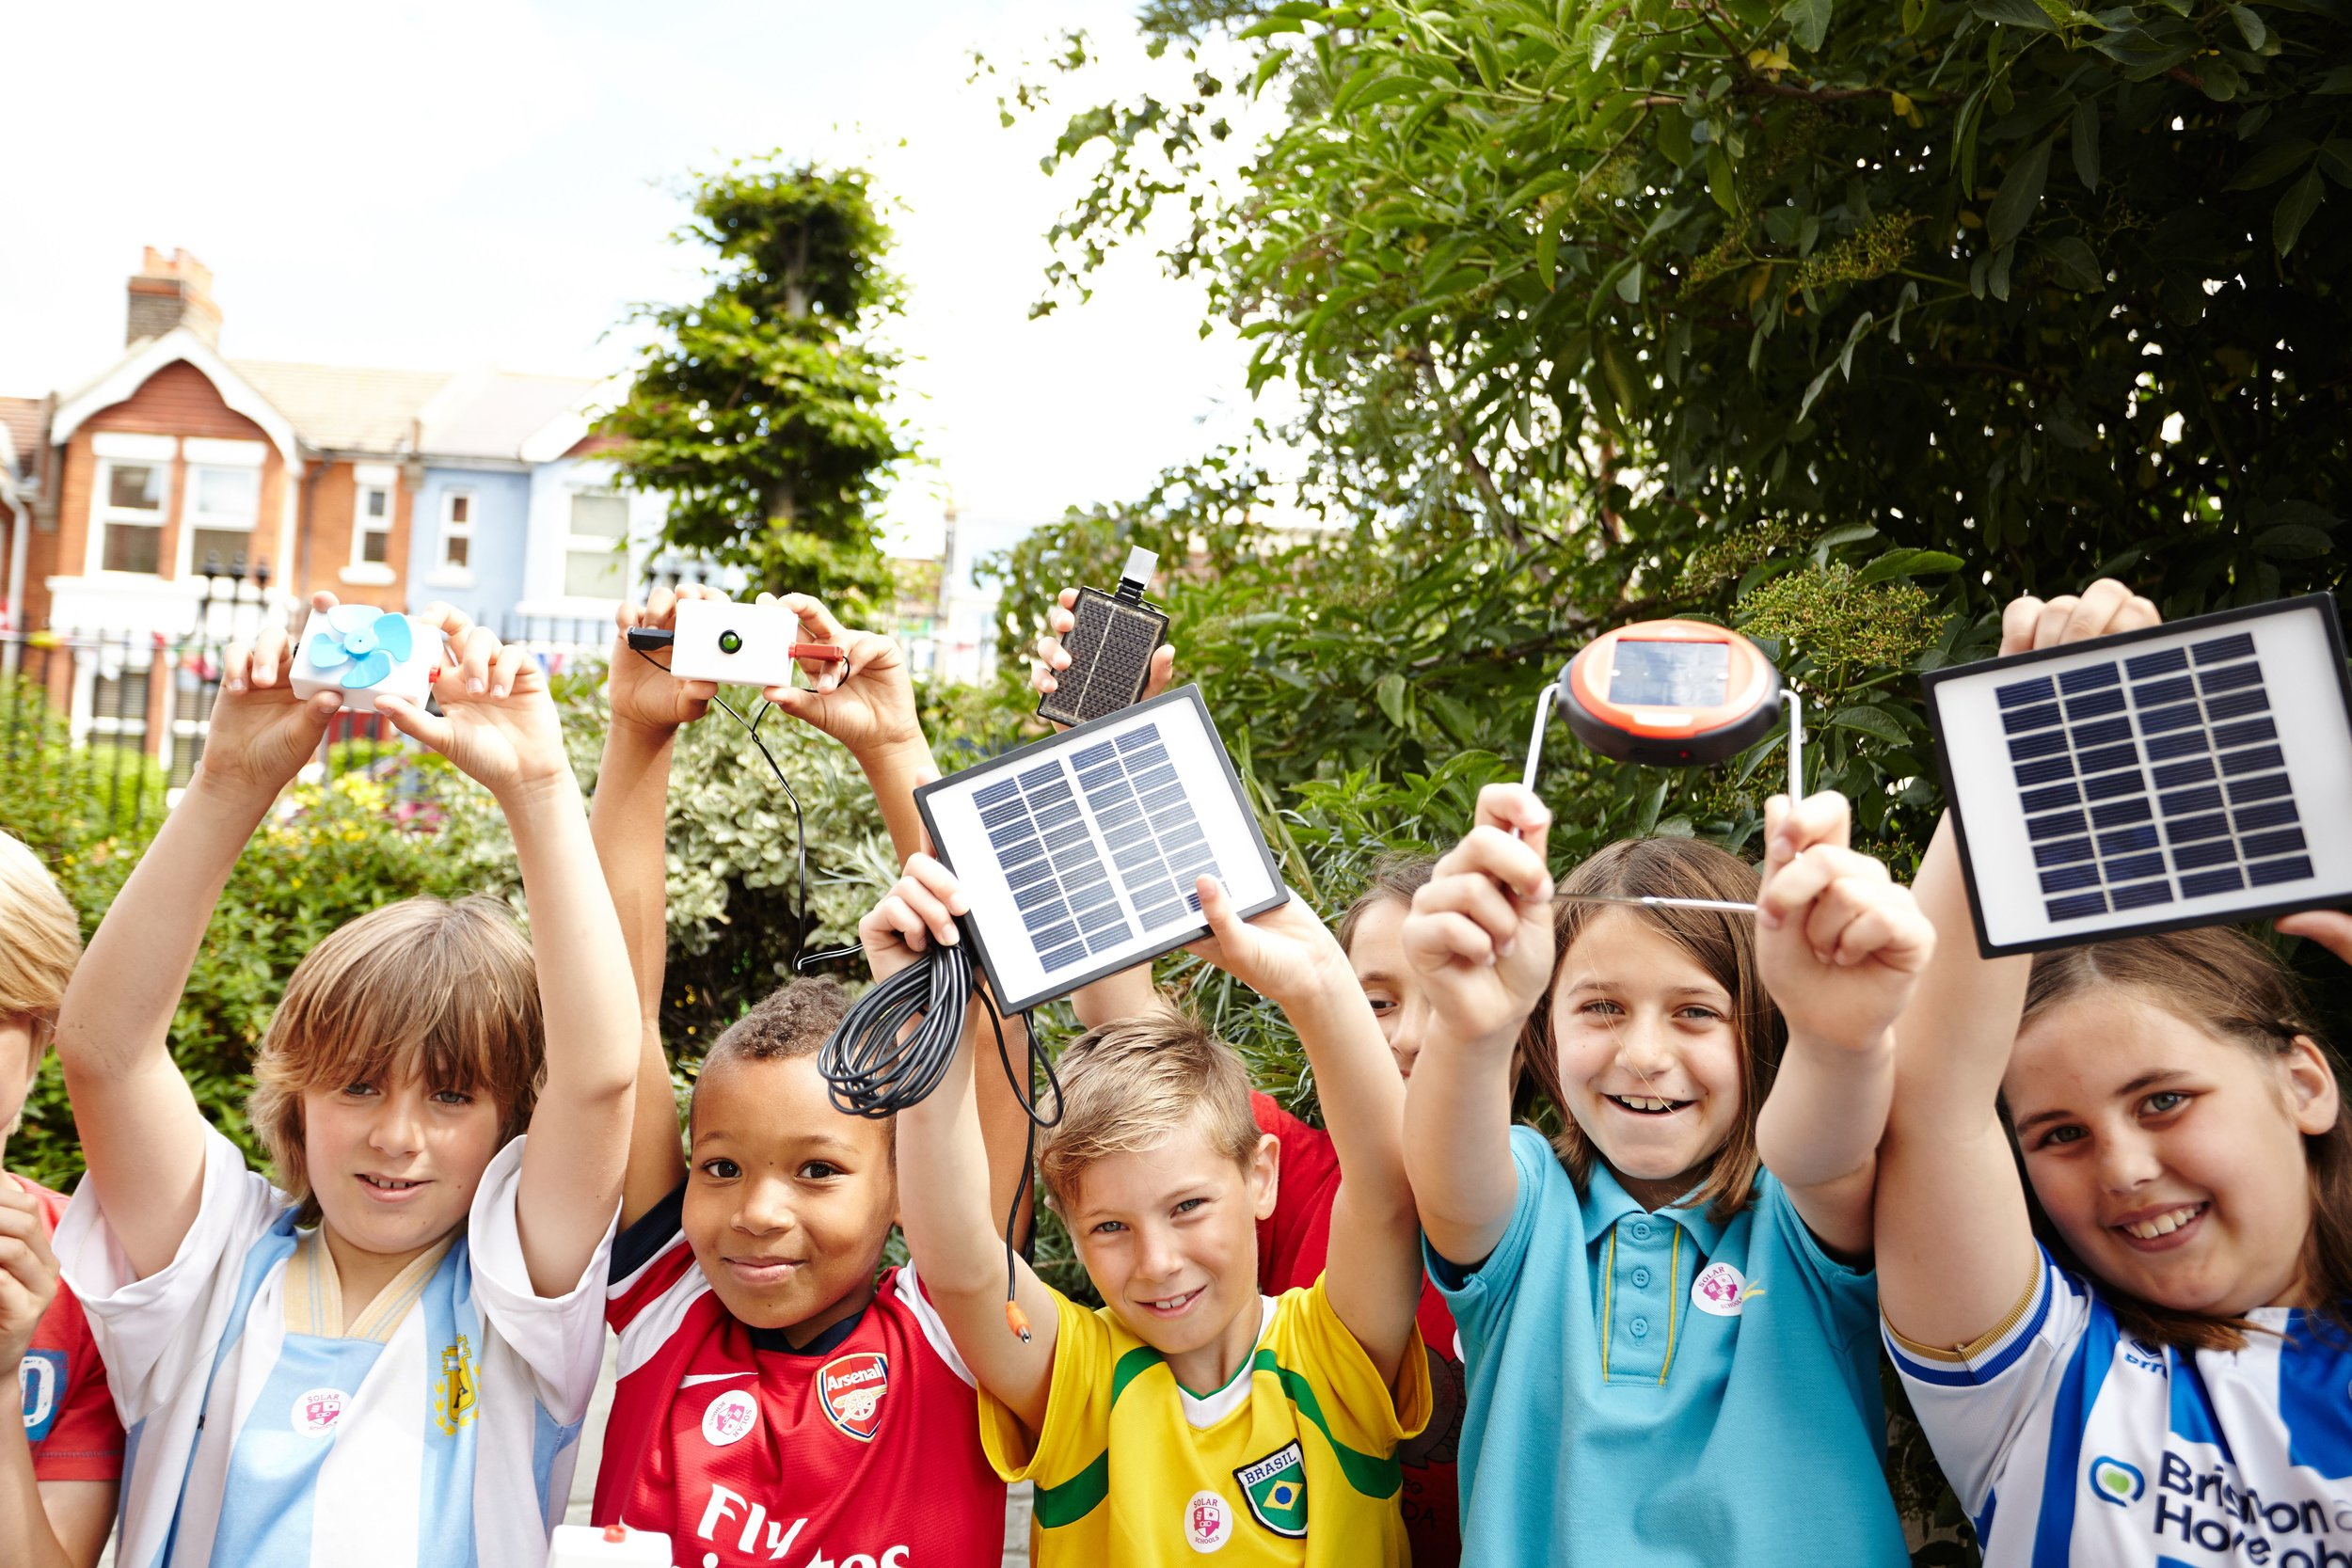 Solar_schools_Brighton_065.jpg